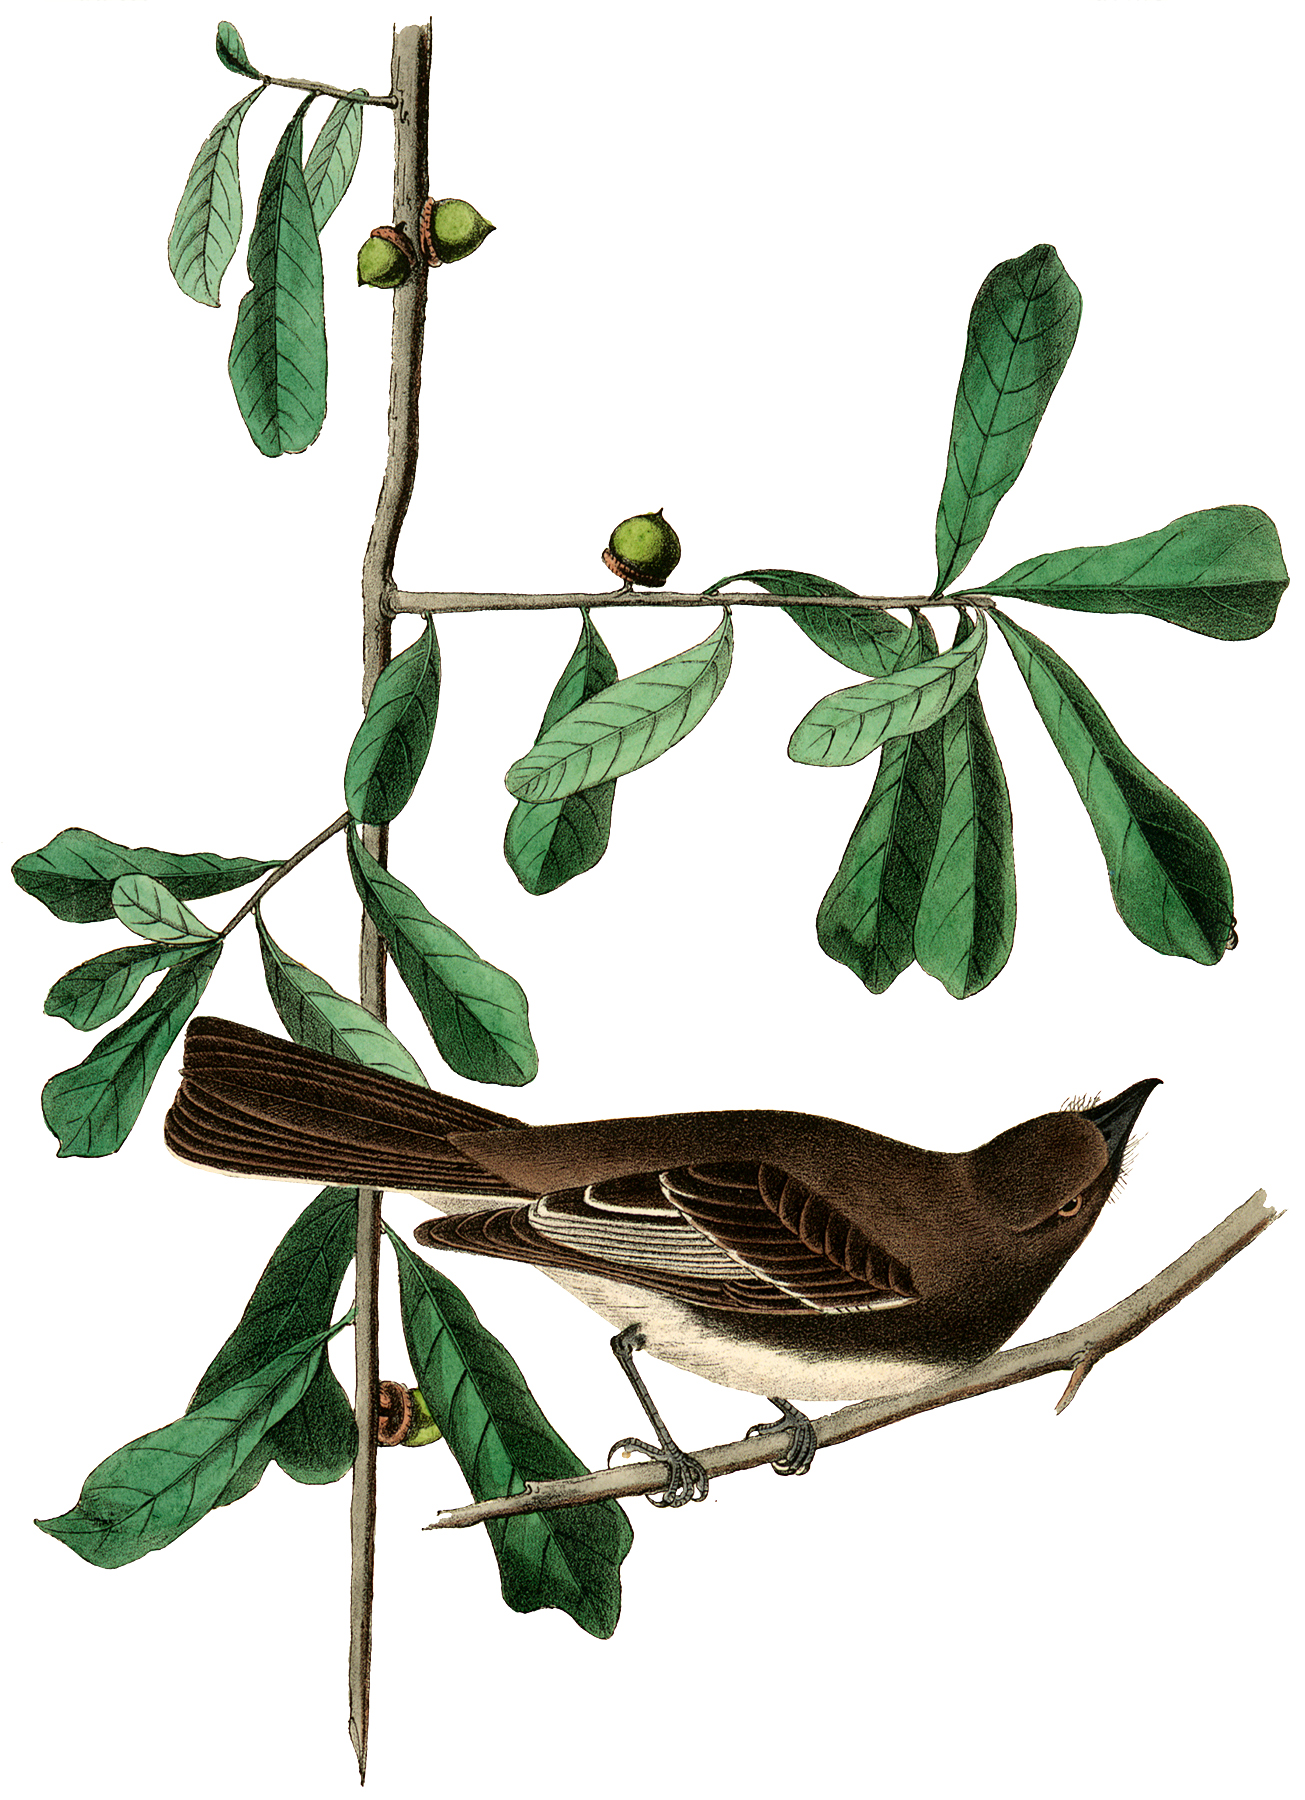 Vintage Bird with Green Acorns Image